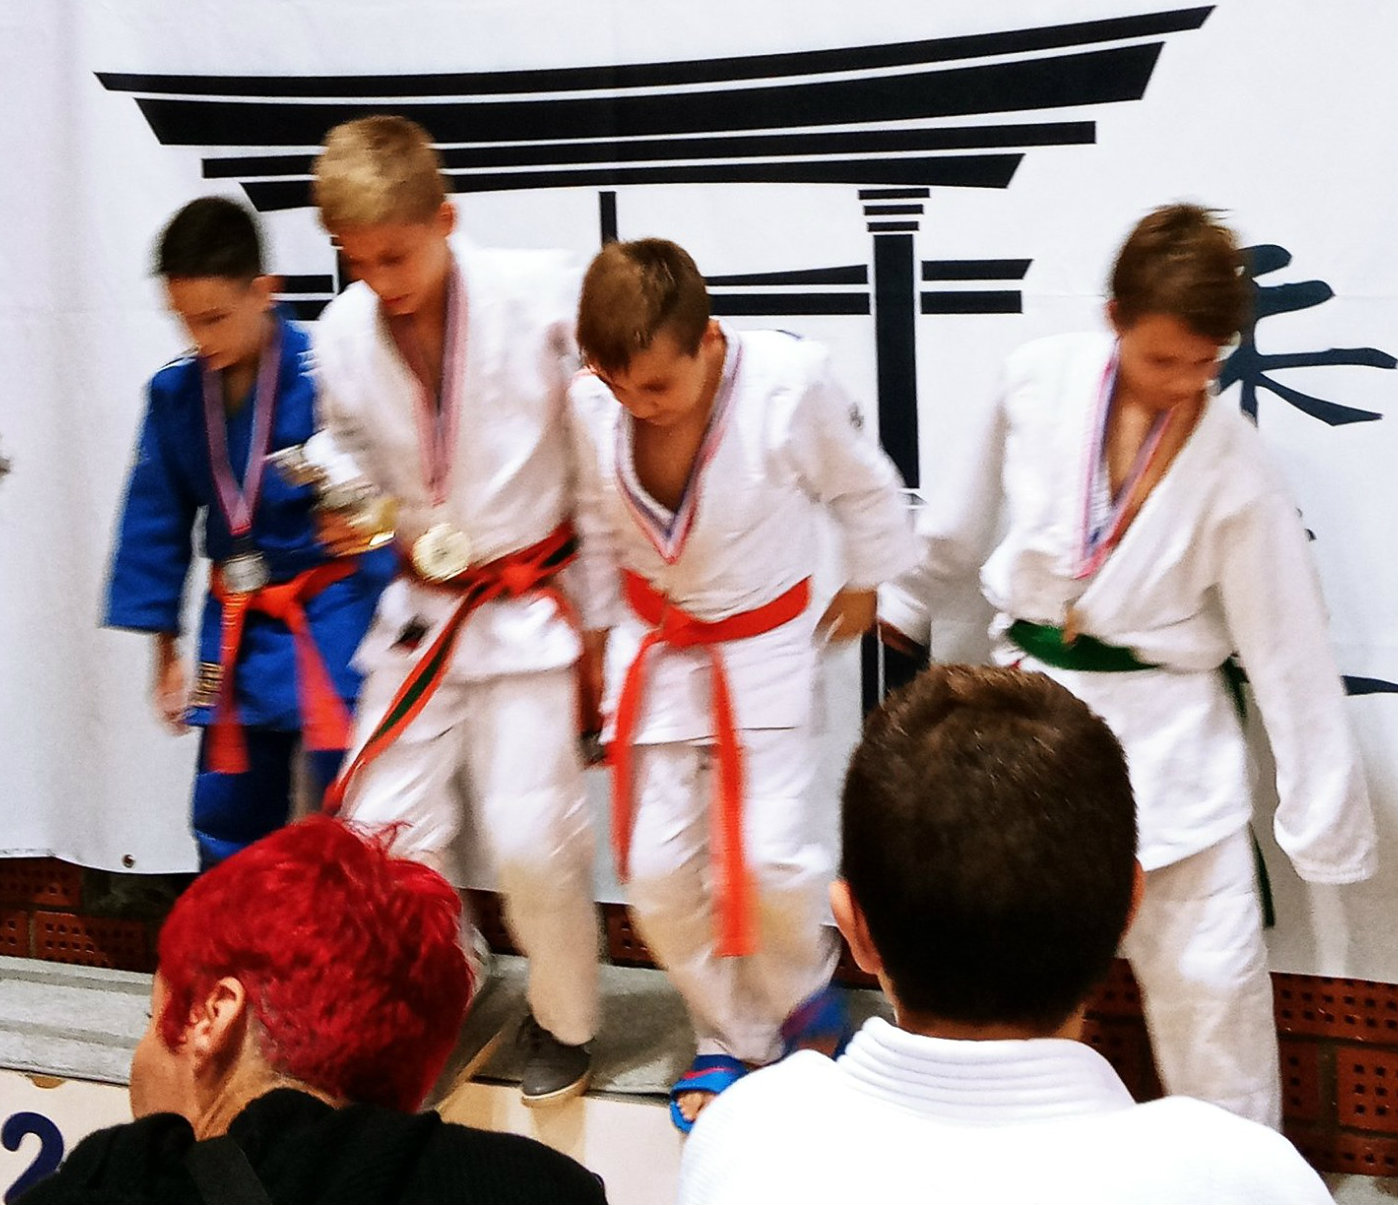 judoist judo kluba bela krajina, Kristjan Kočevar, osvoji 3. mesto